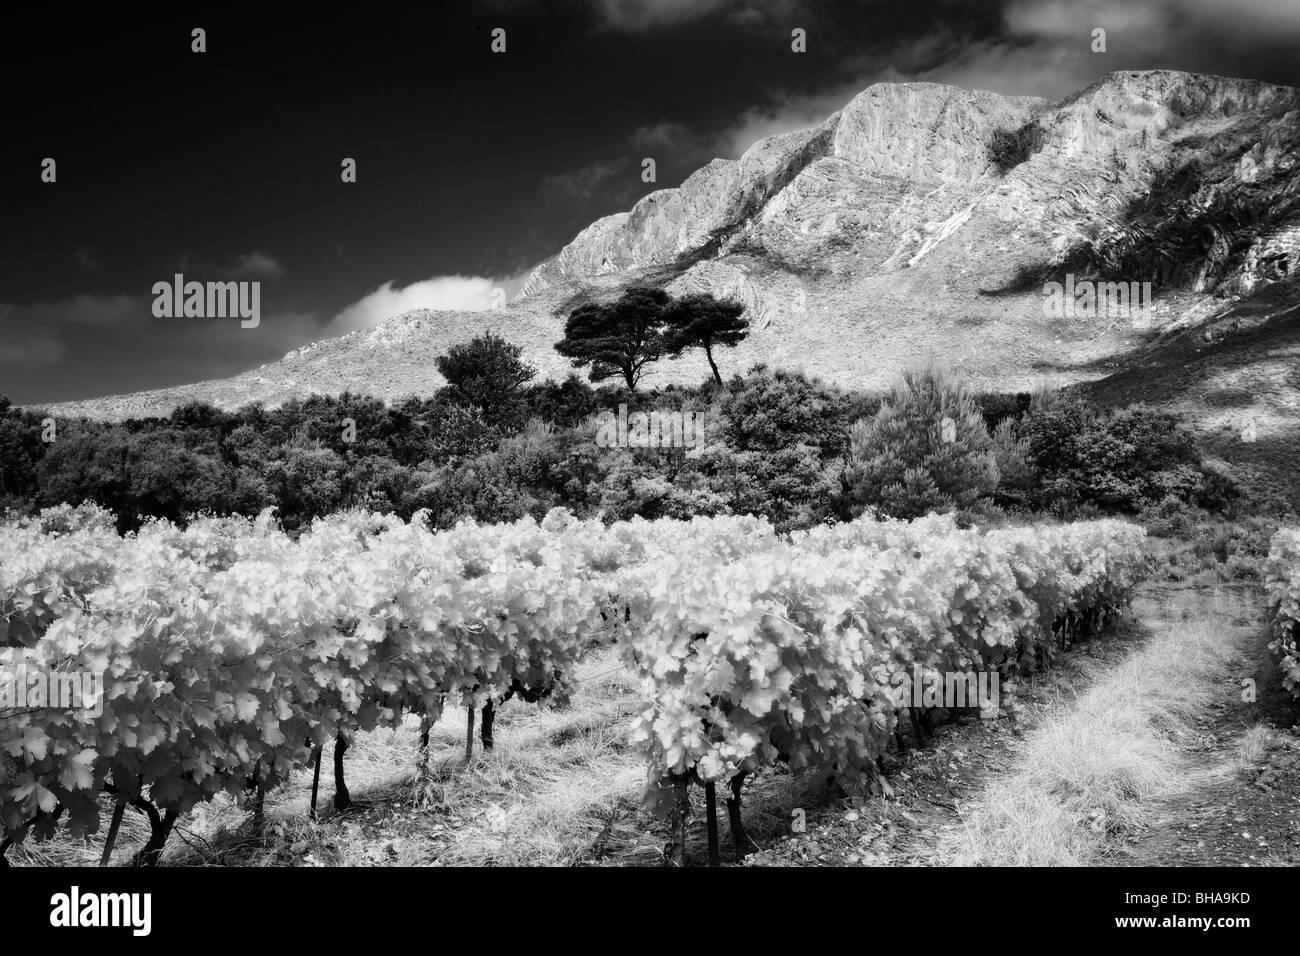 a vineyard nr Puyloubier & Montagne Ste Victoire, Bouches-du-Rhone, Provence, France - Stock Image